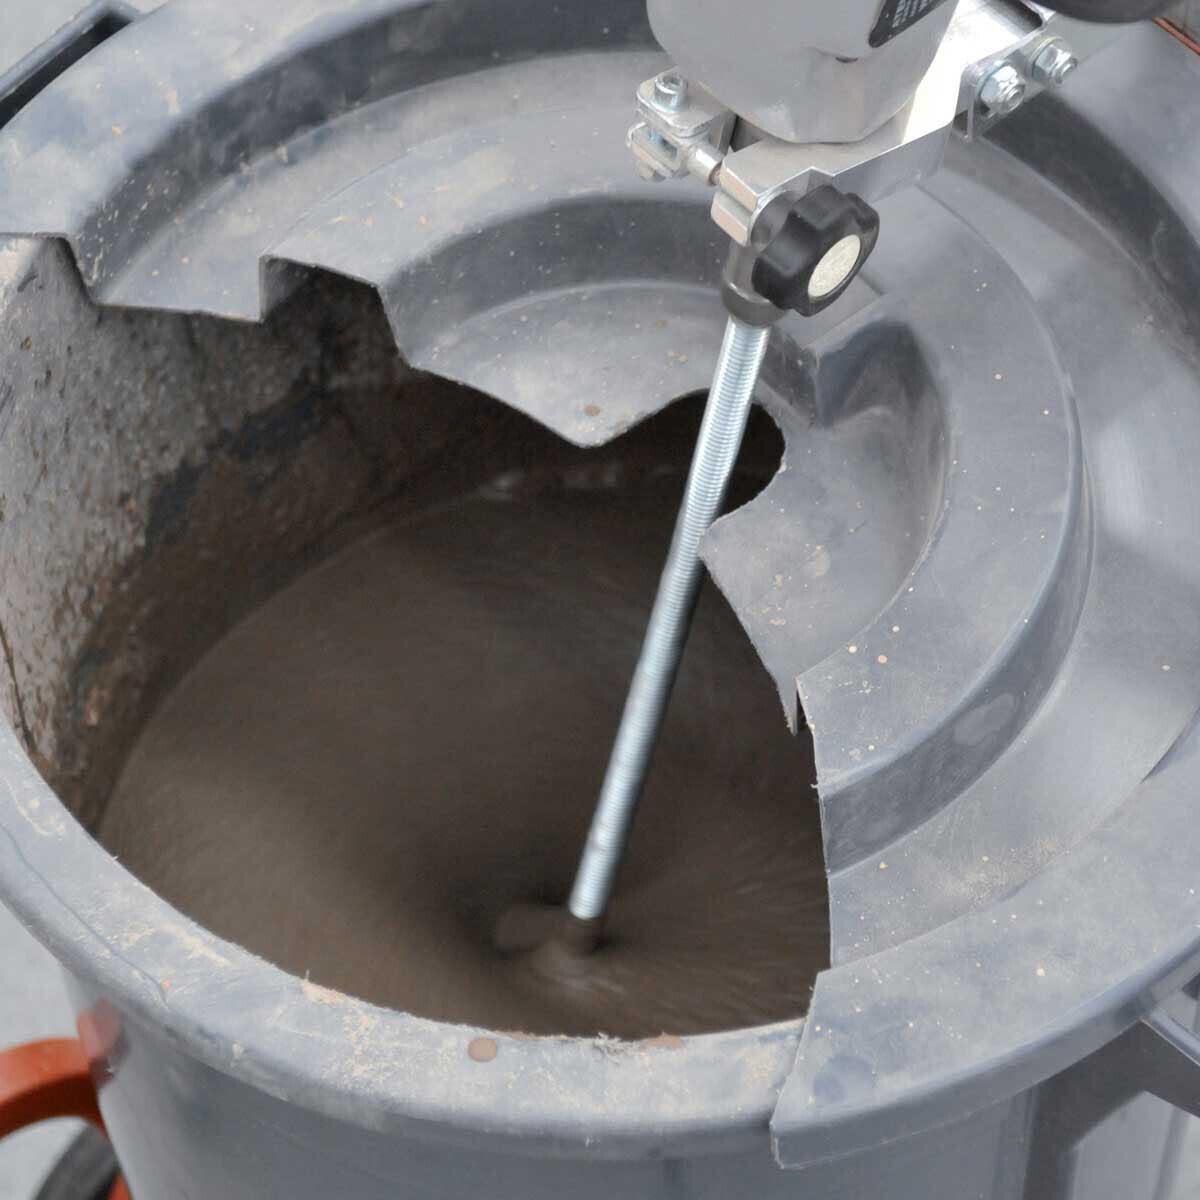 MXFMS Raimondi Fluid Mixing